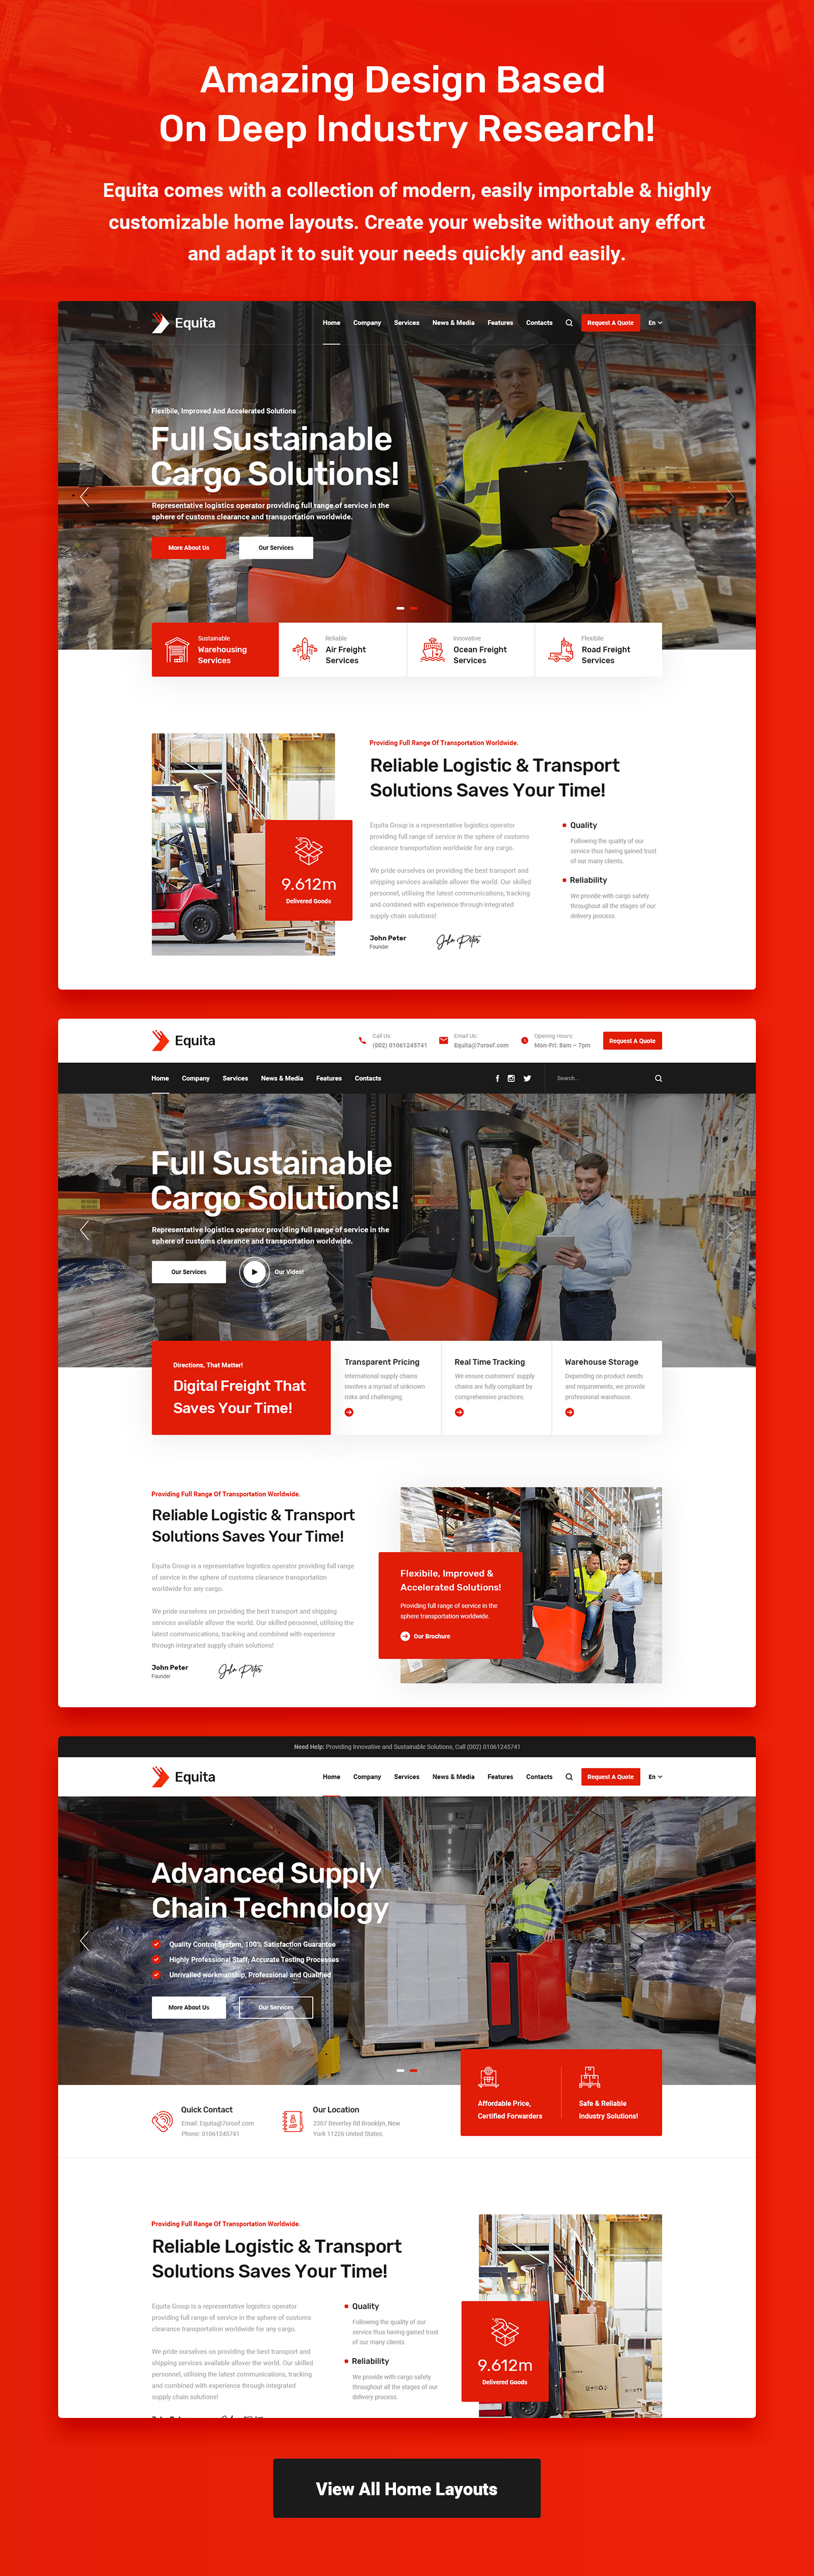 Equita - Logistics Cargo WordPress Theme - 6